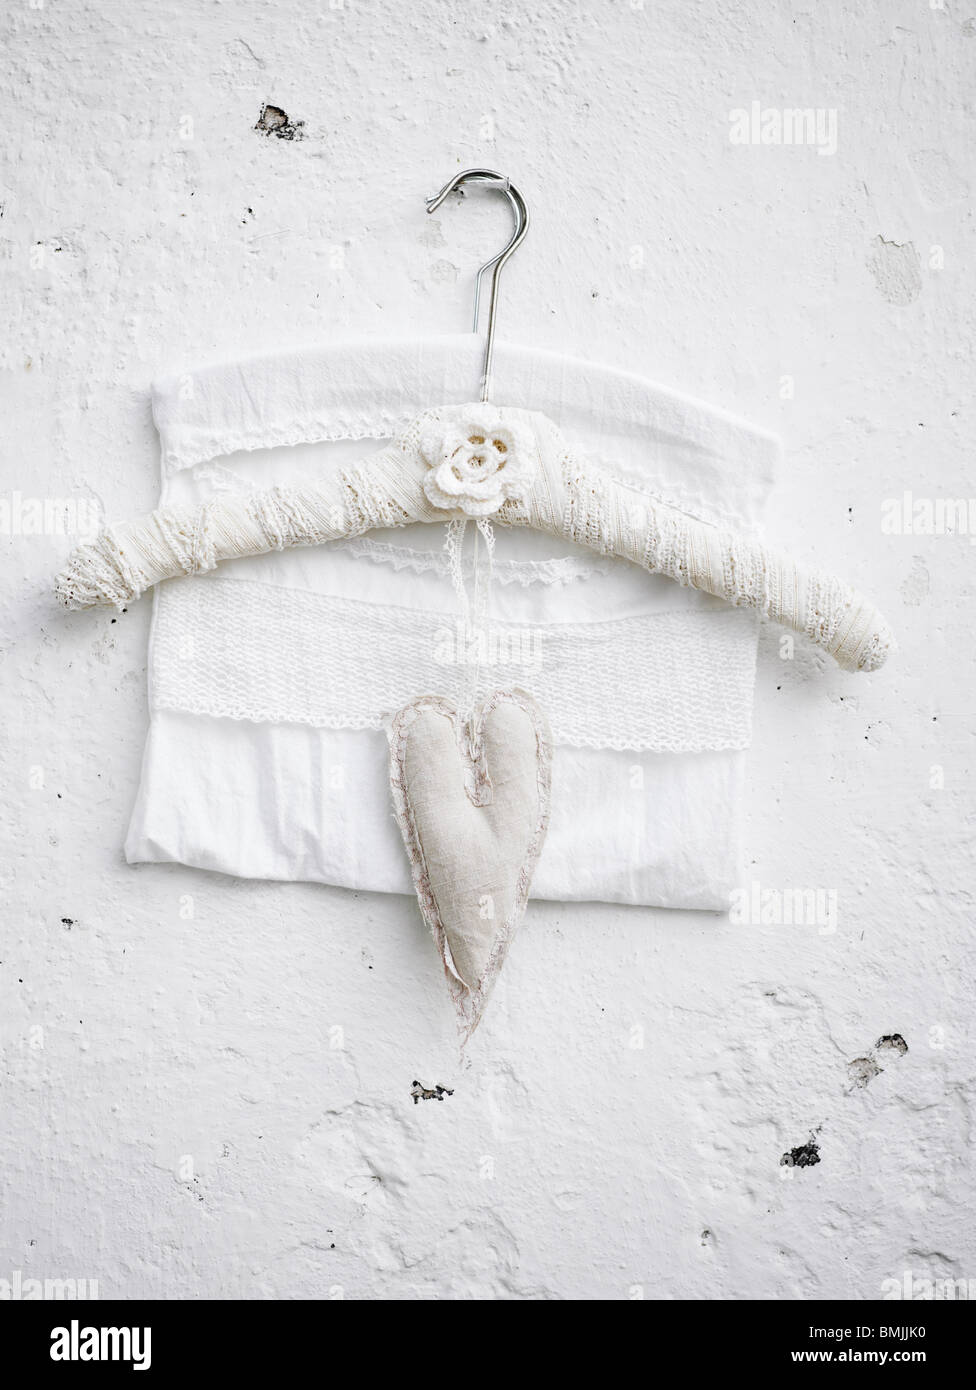 Scandinavia, Sweden, Stockholm, Coat hanger and heart shape hanging on white wall, close-up - Stock Image